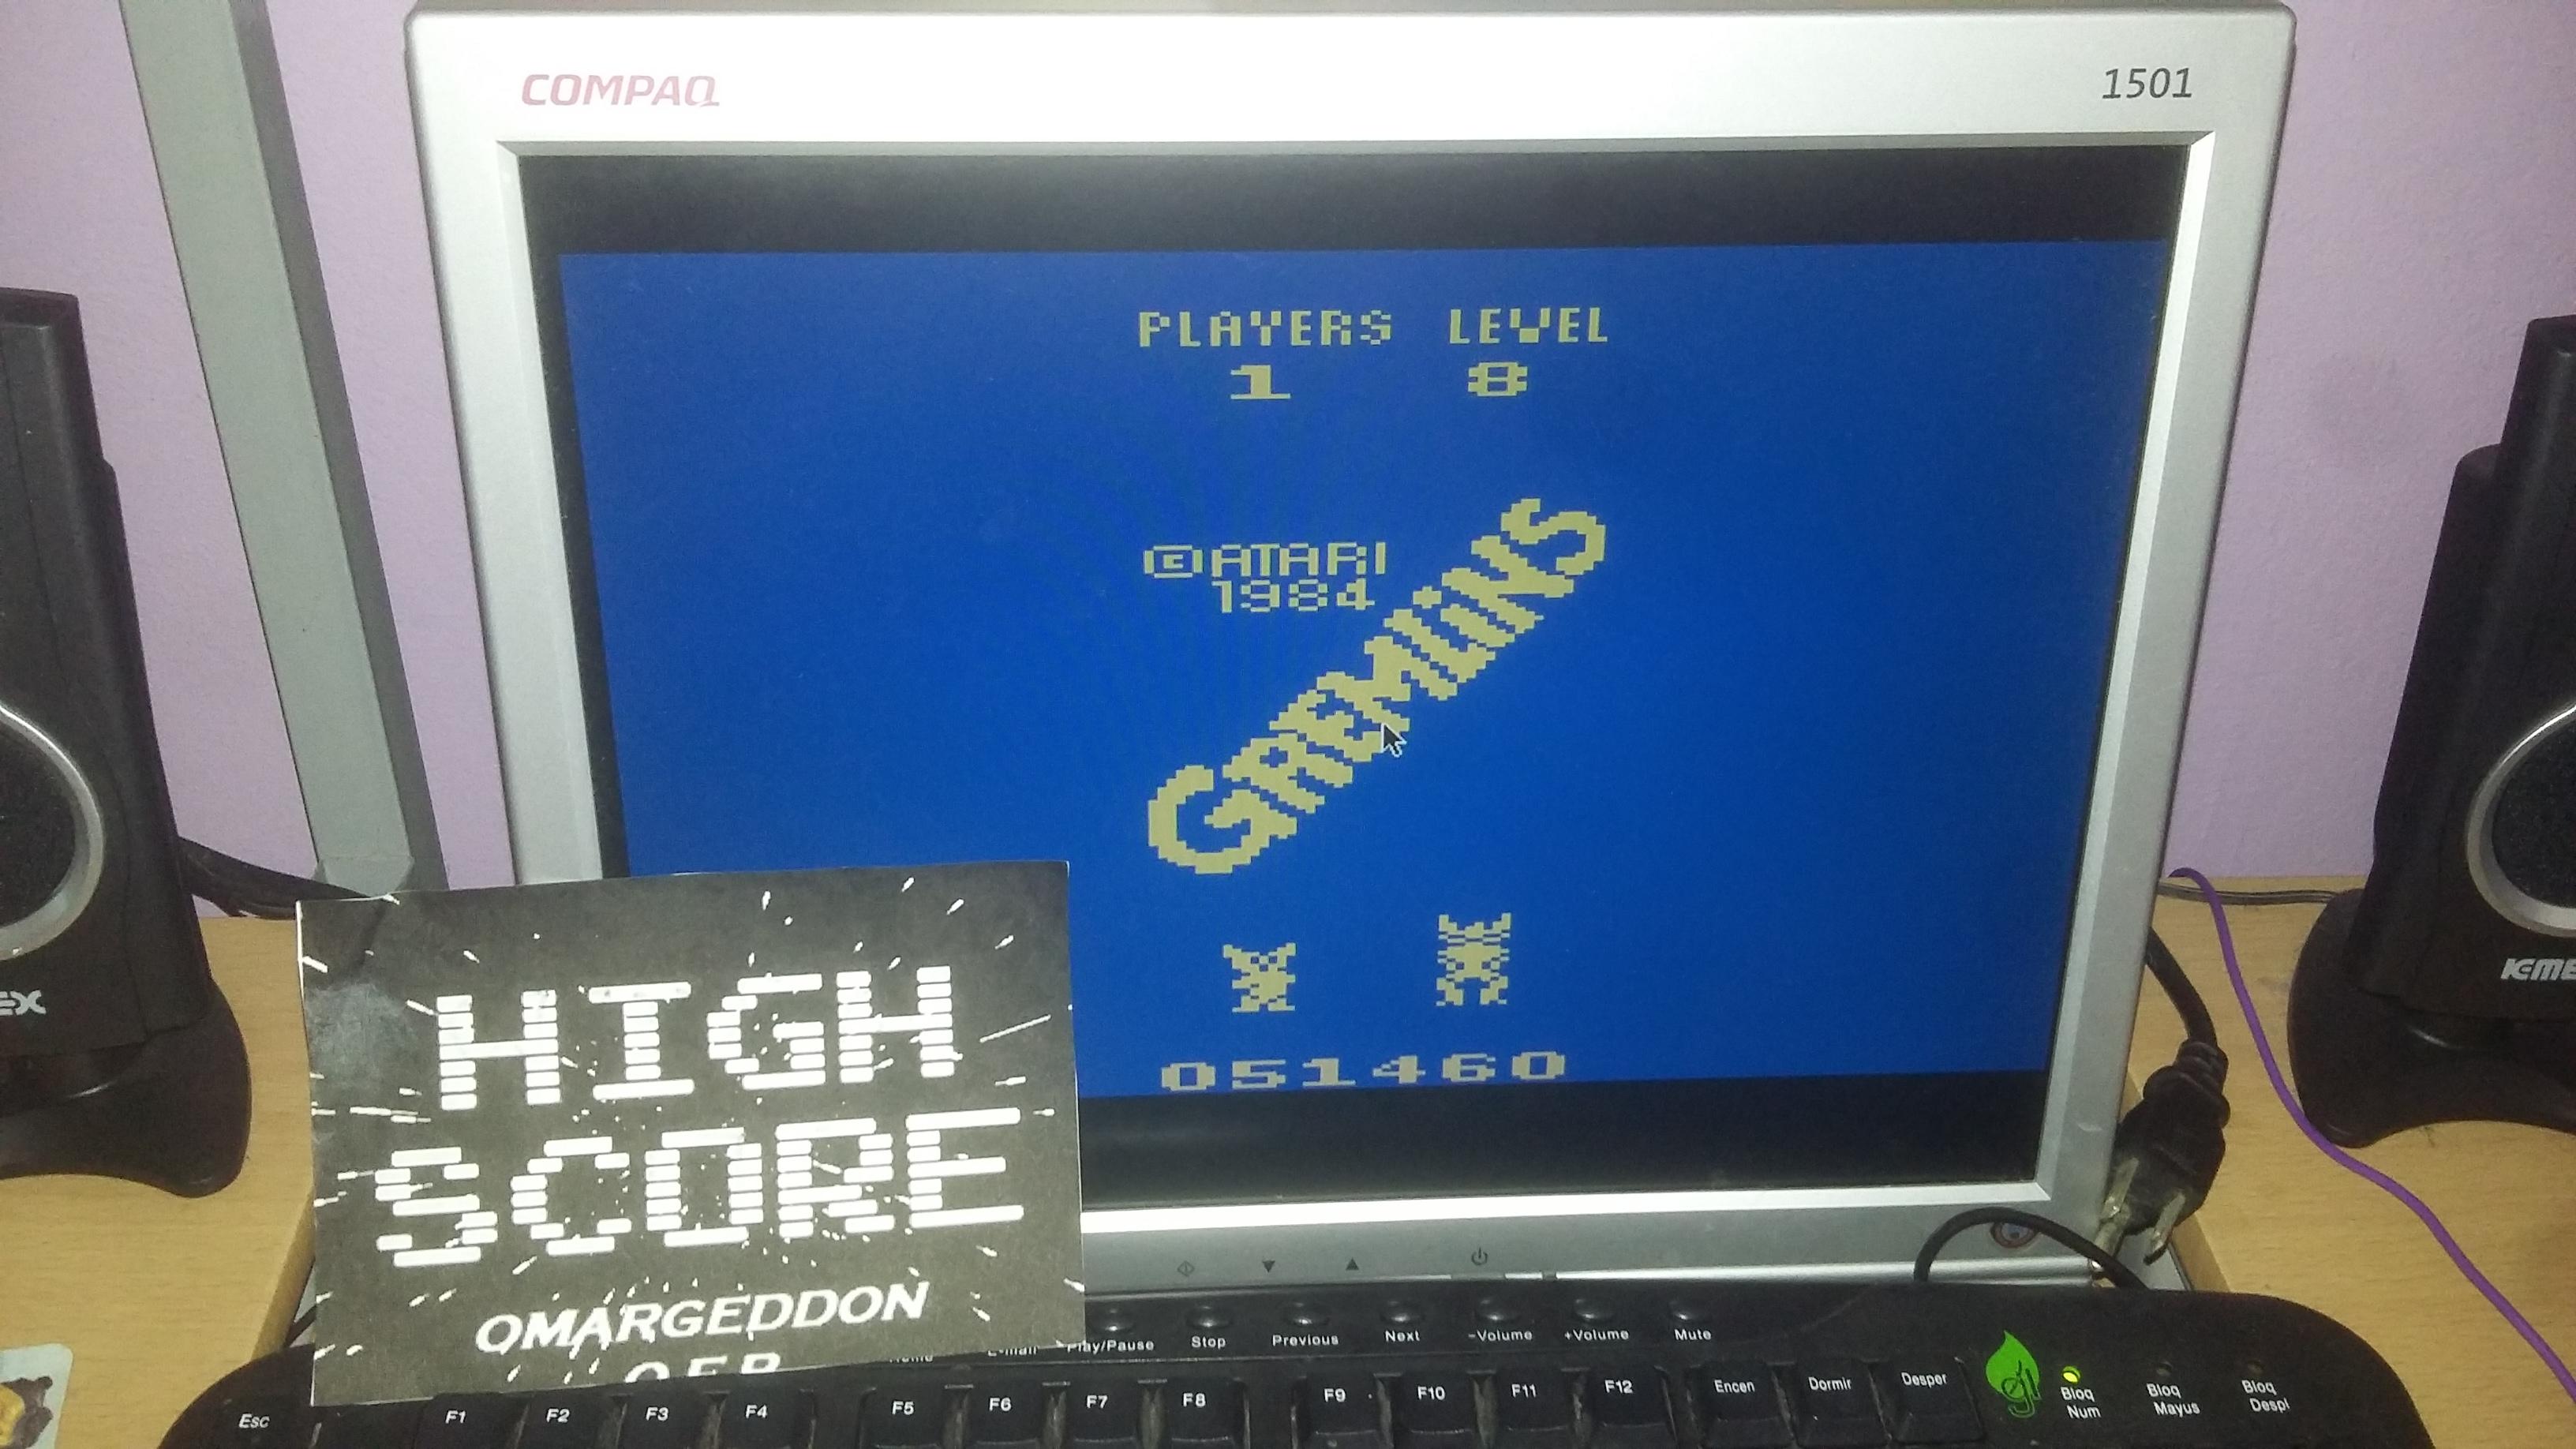 omargeddon: Gremlins (Atari 2600 Emulated Novice/B Mode) 51,460 points on 2016-10-08 12:31:50